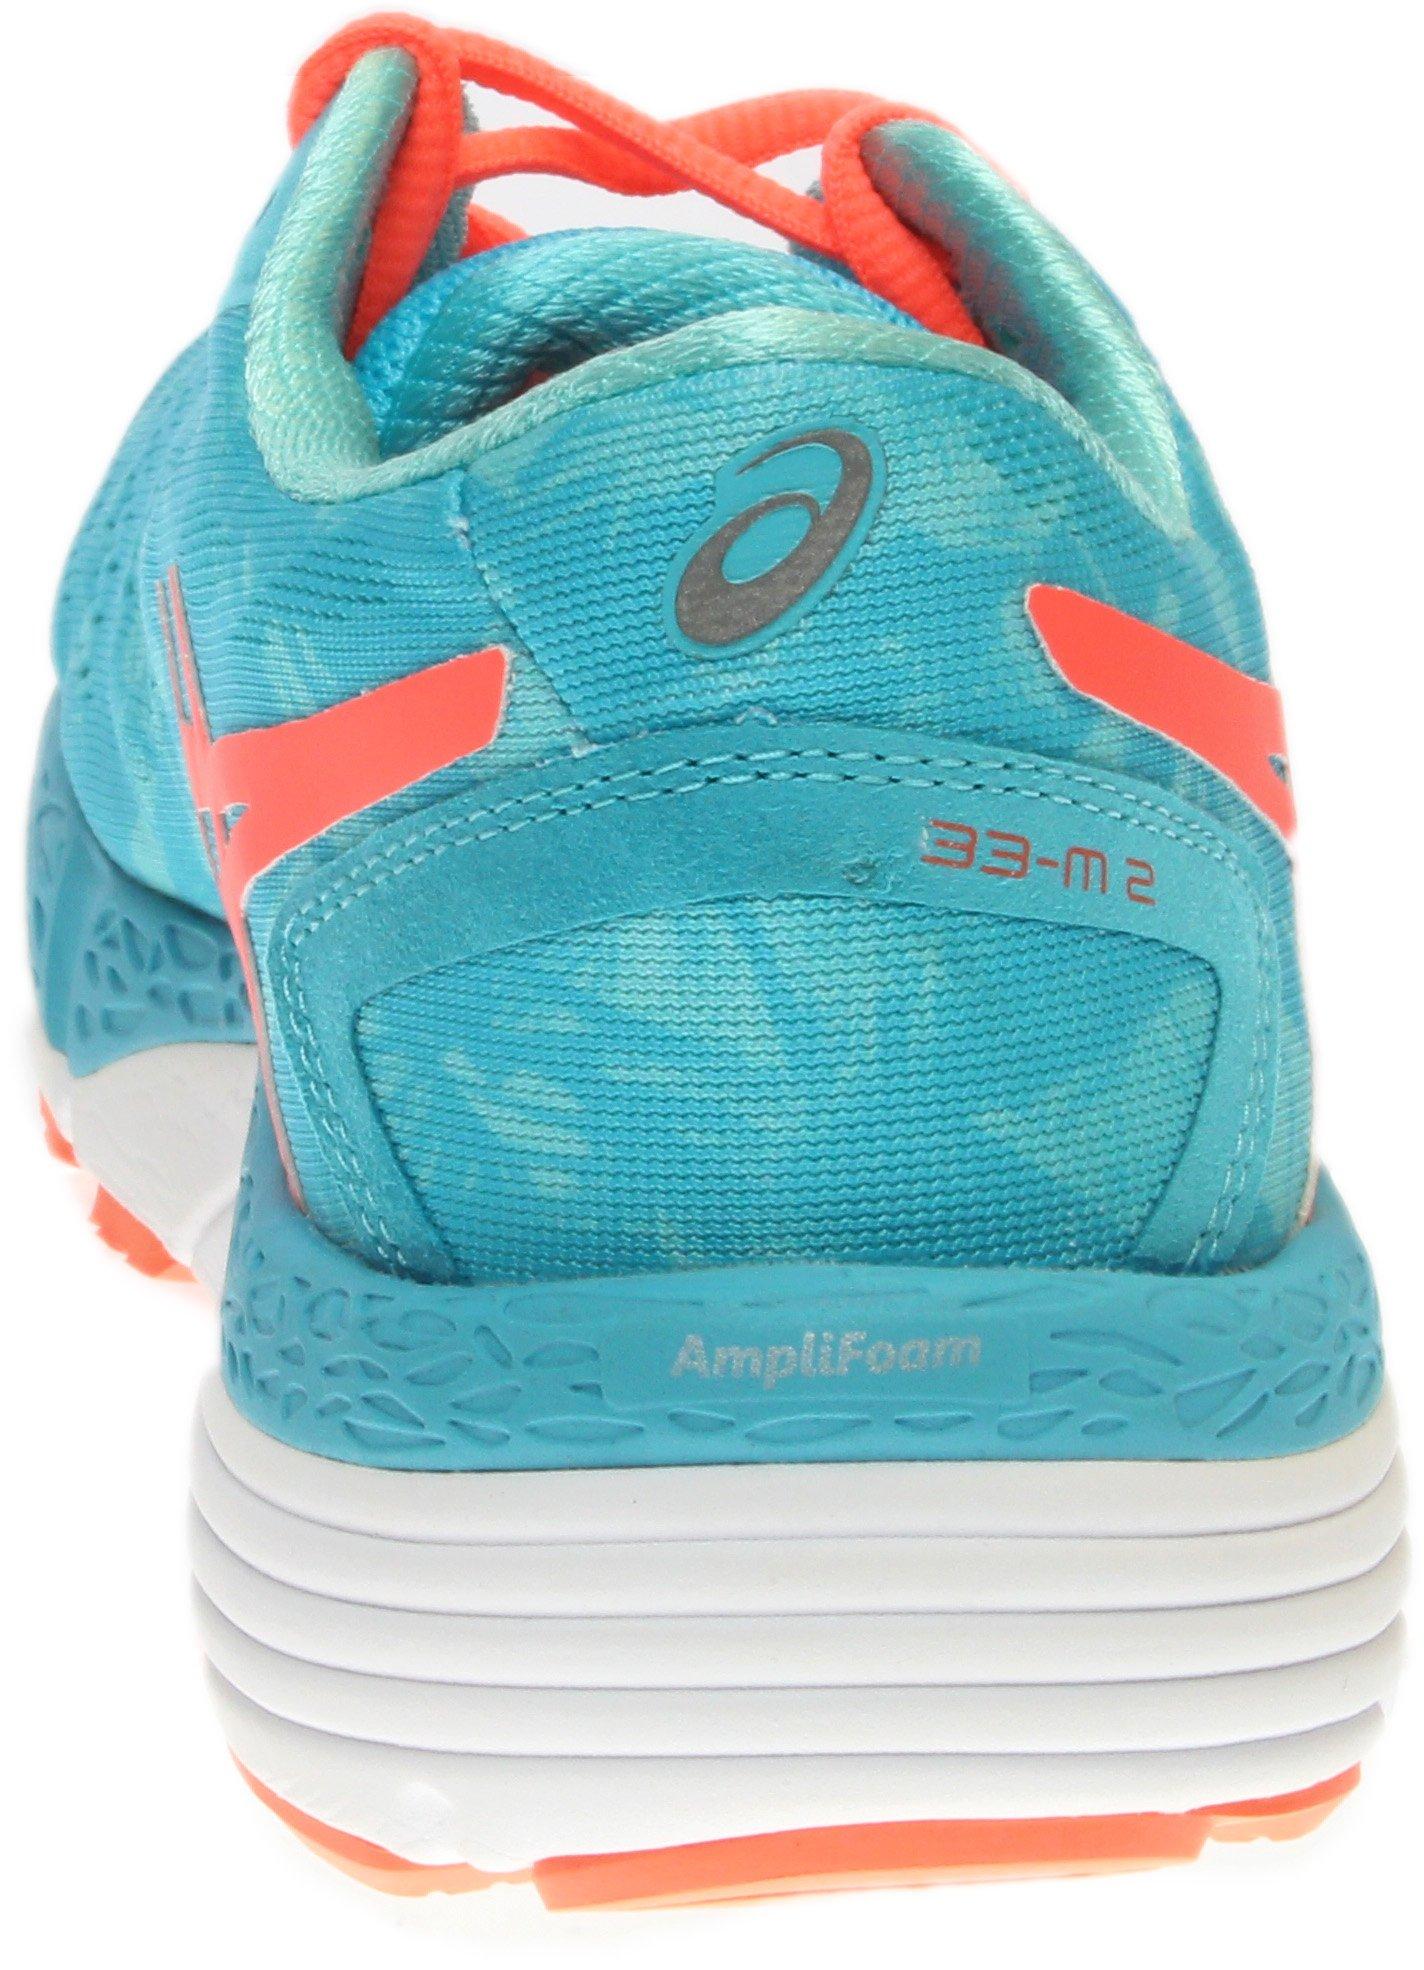 ASICS Women's 33-M 2 Running Shoe, Aquarium/Flash Coral/Aruba Blue, 9.5 M US by ASICS (Image #3)